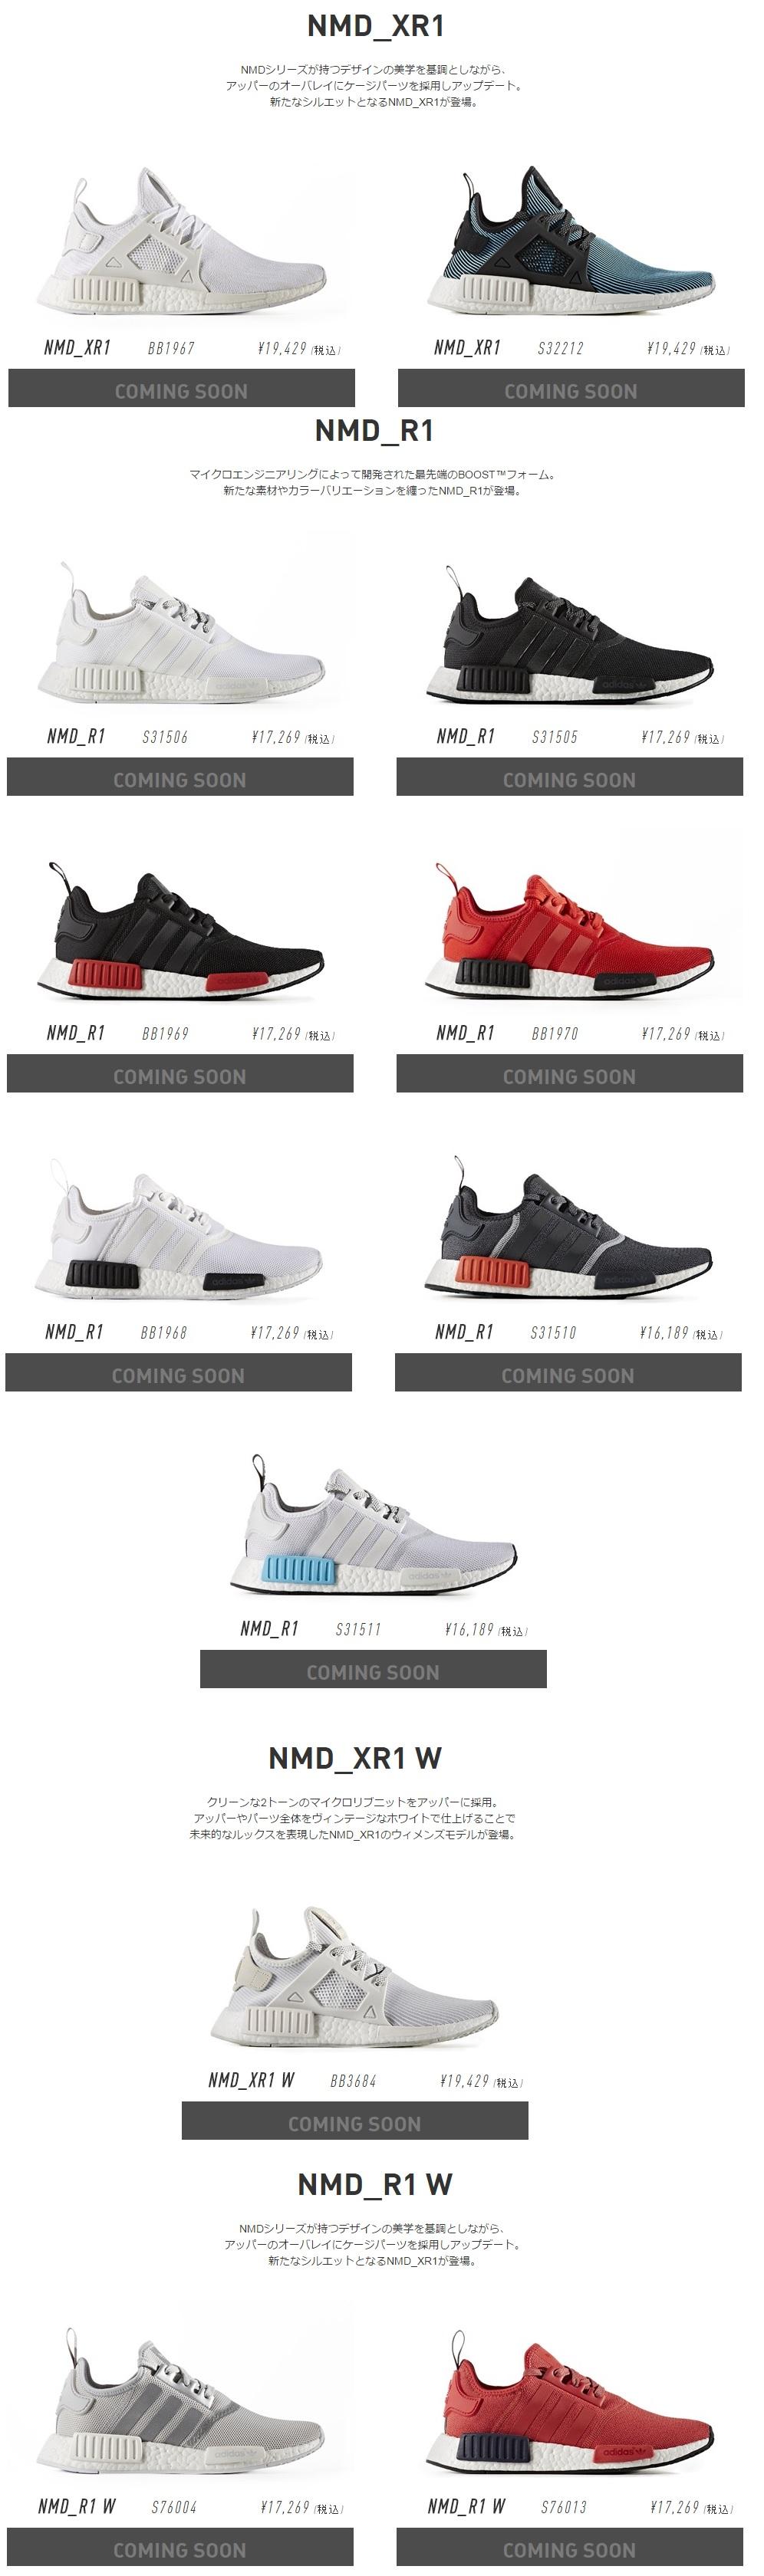 adidas-nmd-xr1-r1-release-20160818